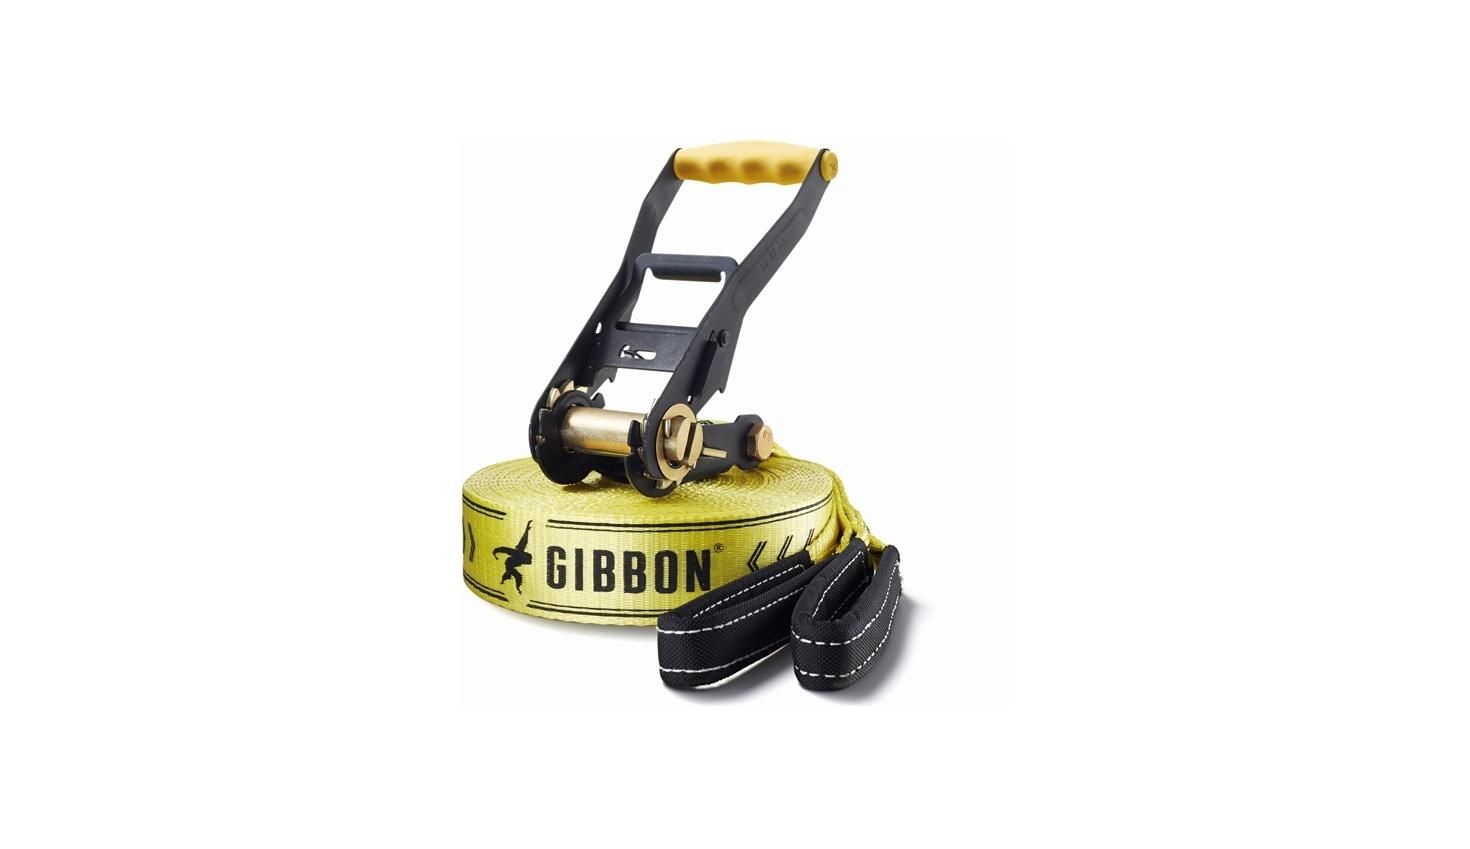 gibbon_classic_line_15m1470x8491